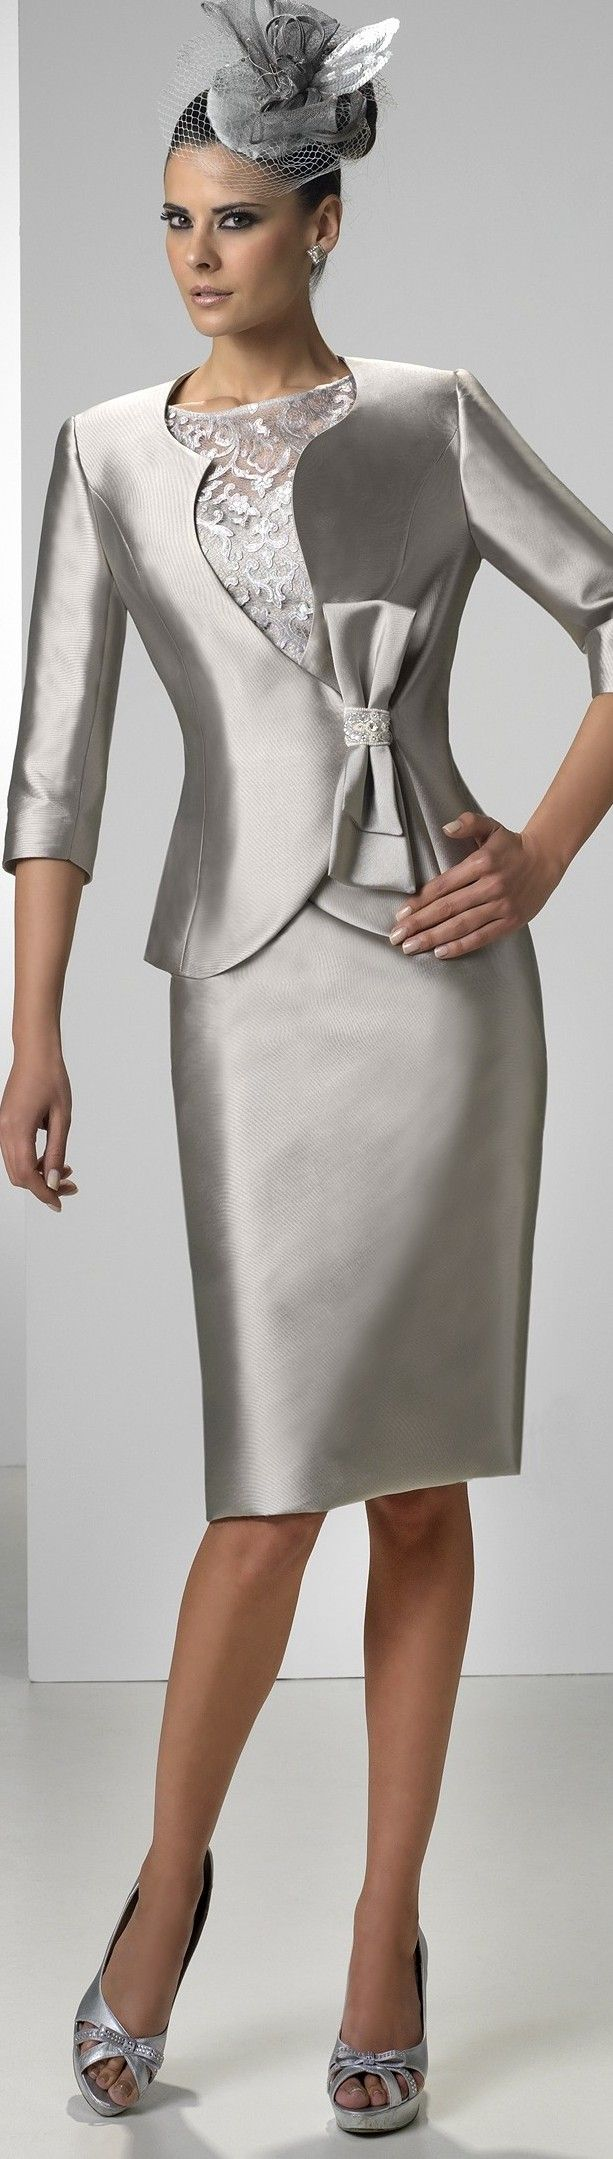 Raffaello 2015- ugly, but it raises some design possibilities